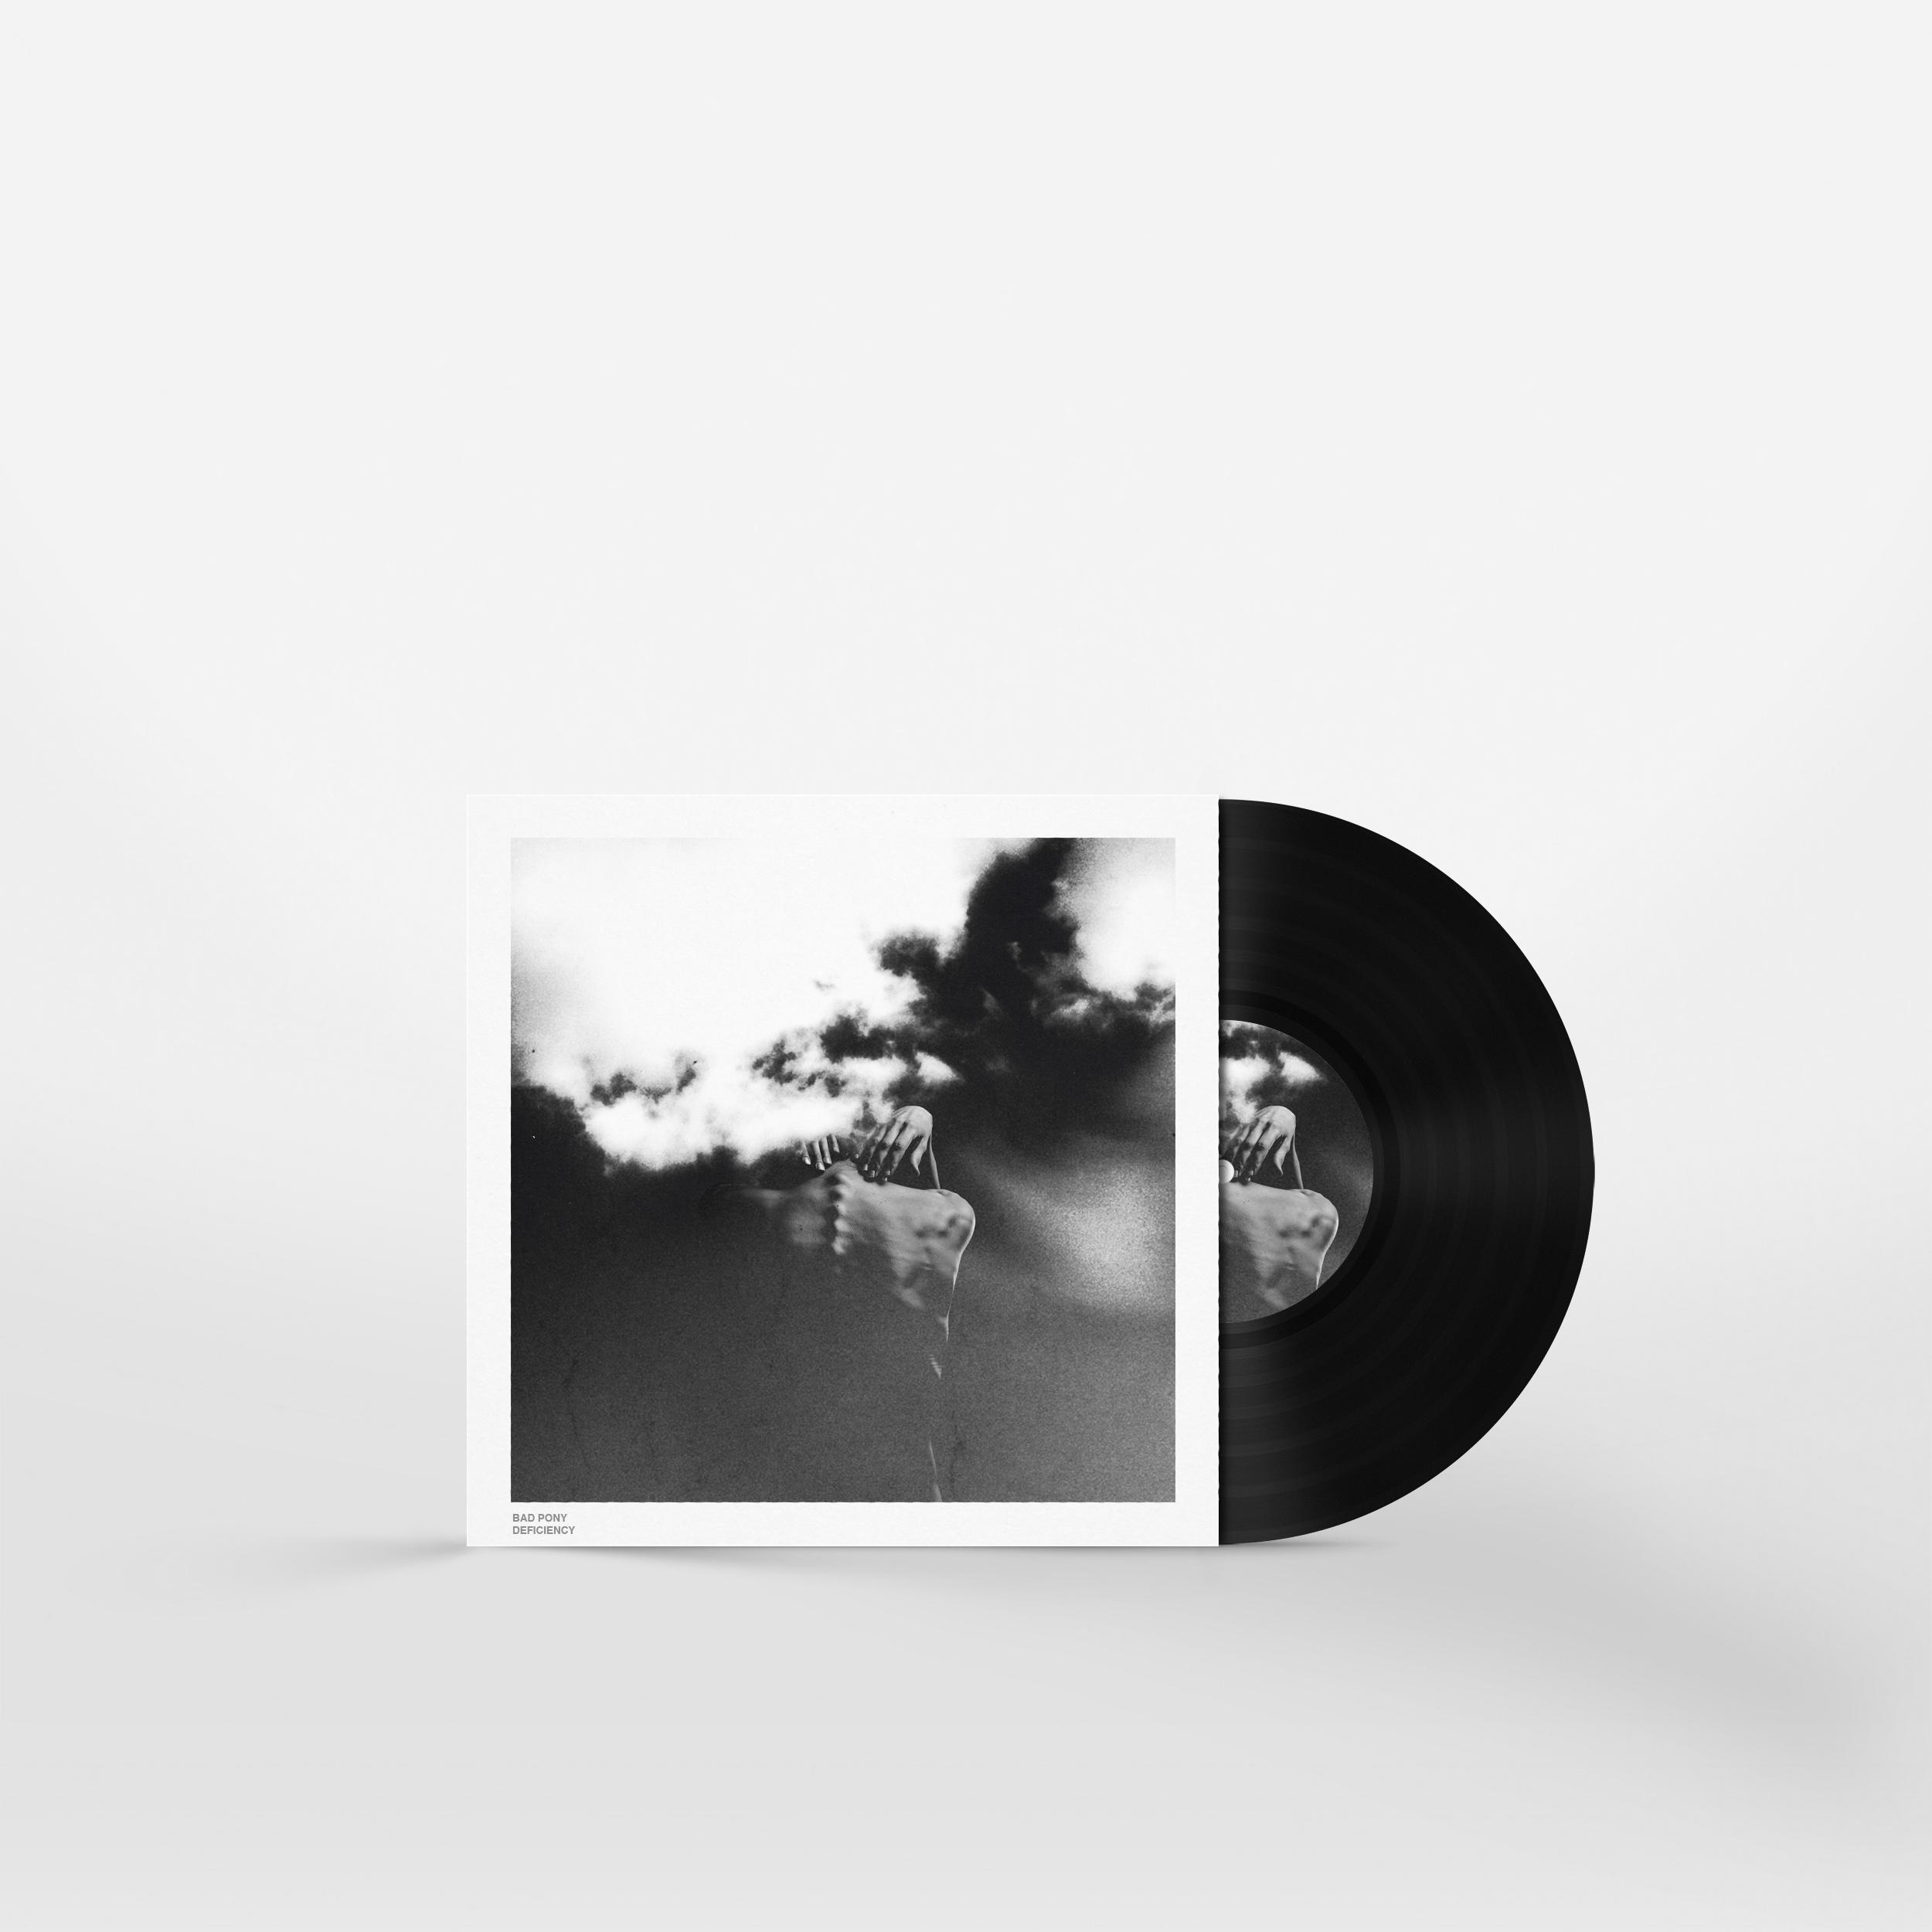 Vinyl-Disc-Mockup.jpg